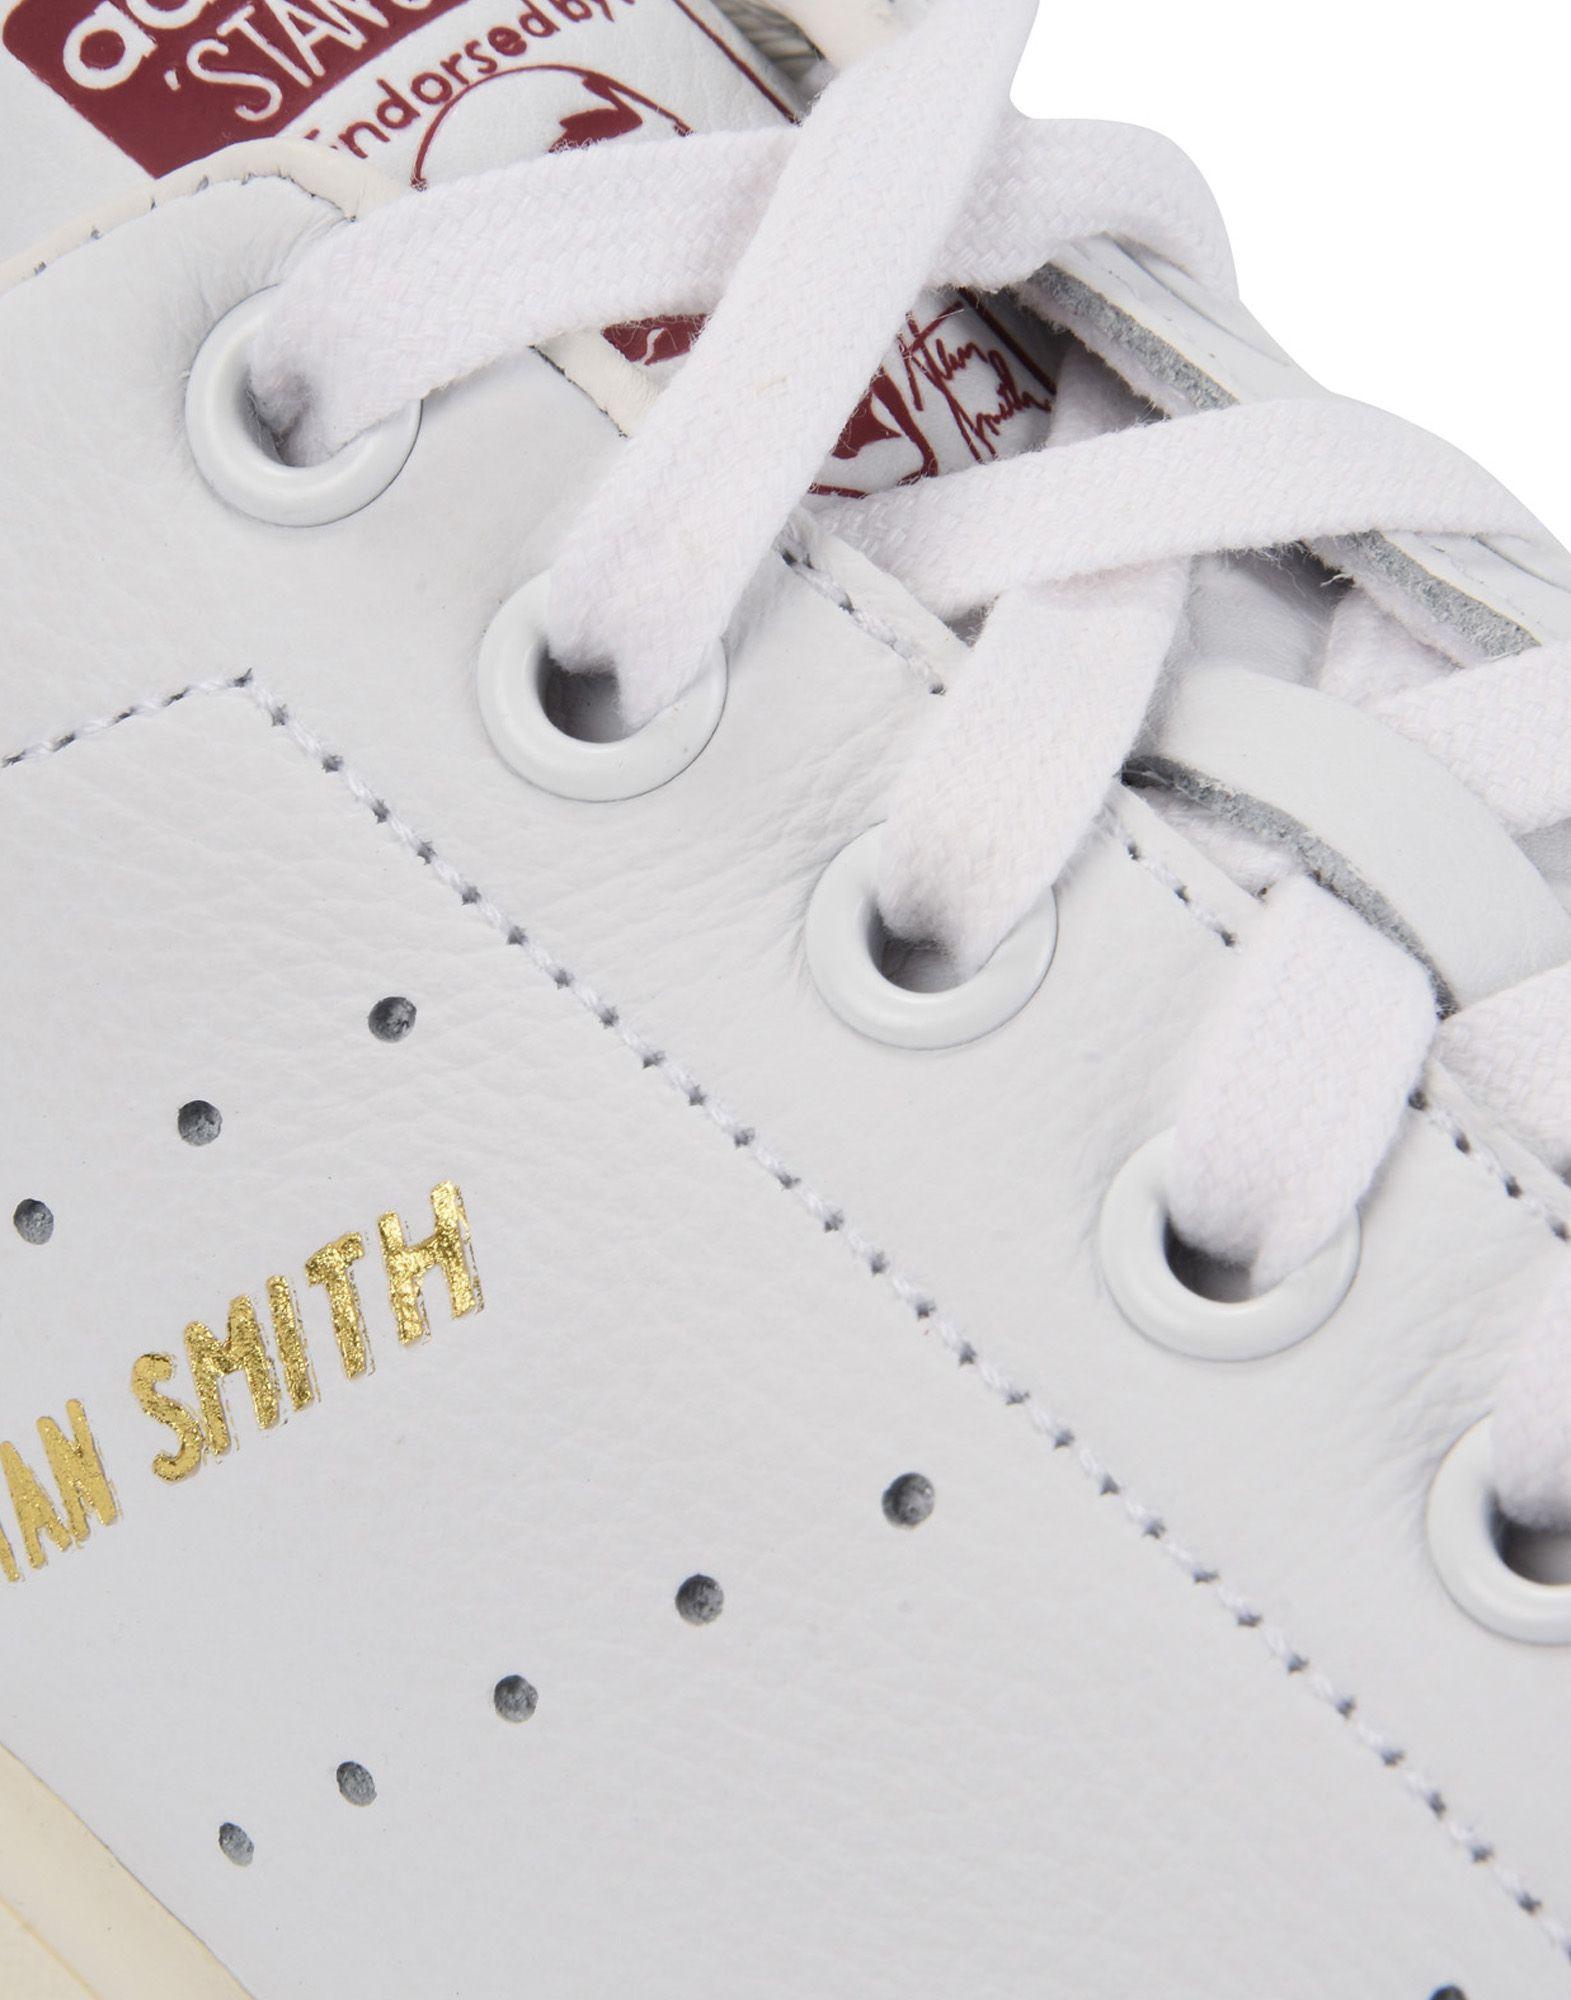 Sneakers Adidas Originals Stan Smith - Homme - Sneakers Adidas Originals sur